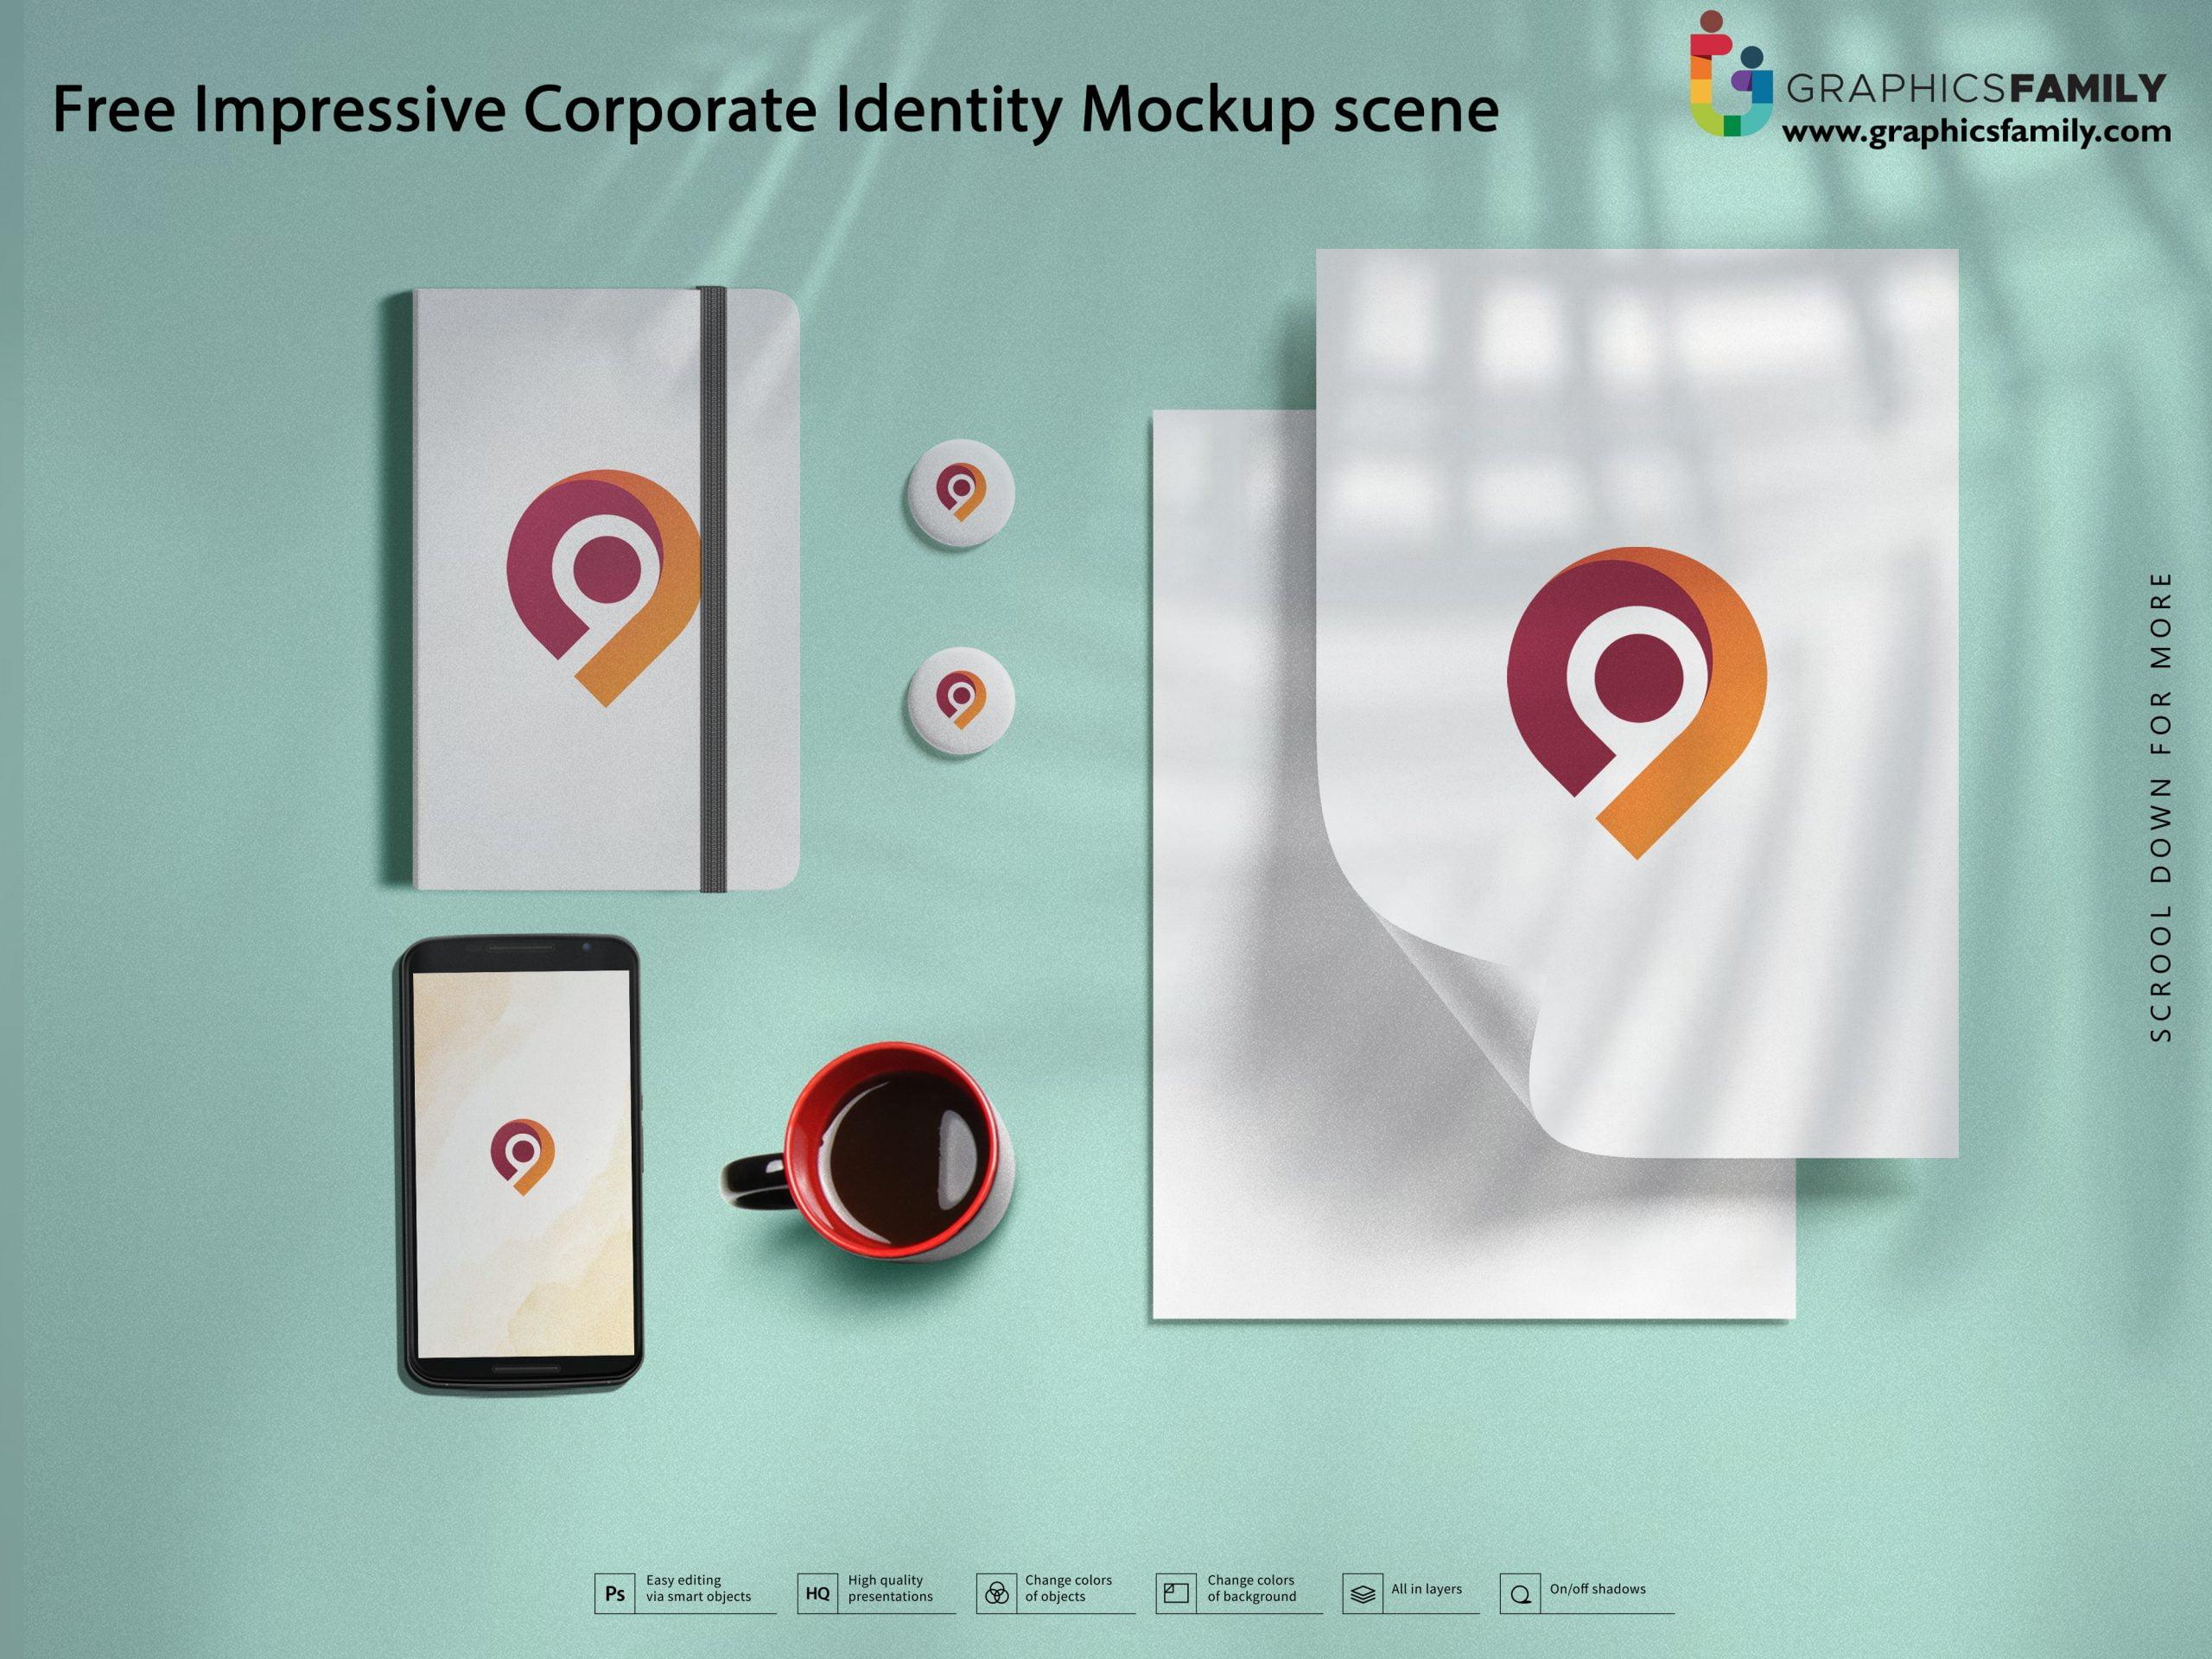 Free Impressive Corporate Identity Mockup scene Download